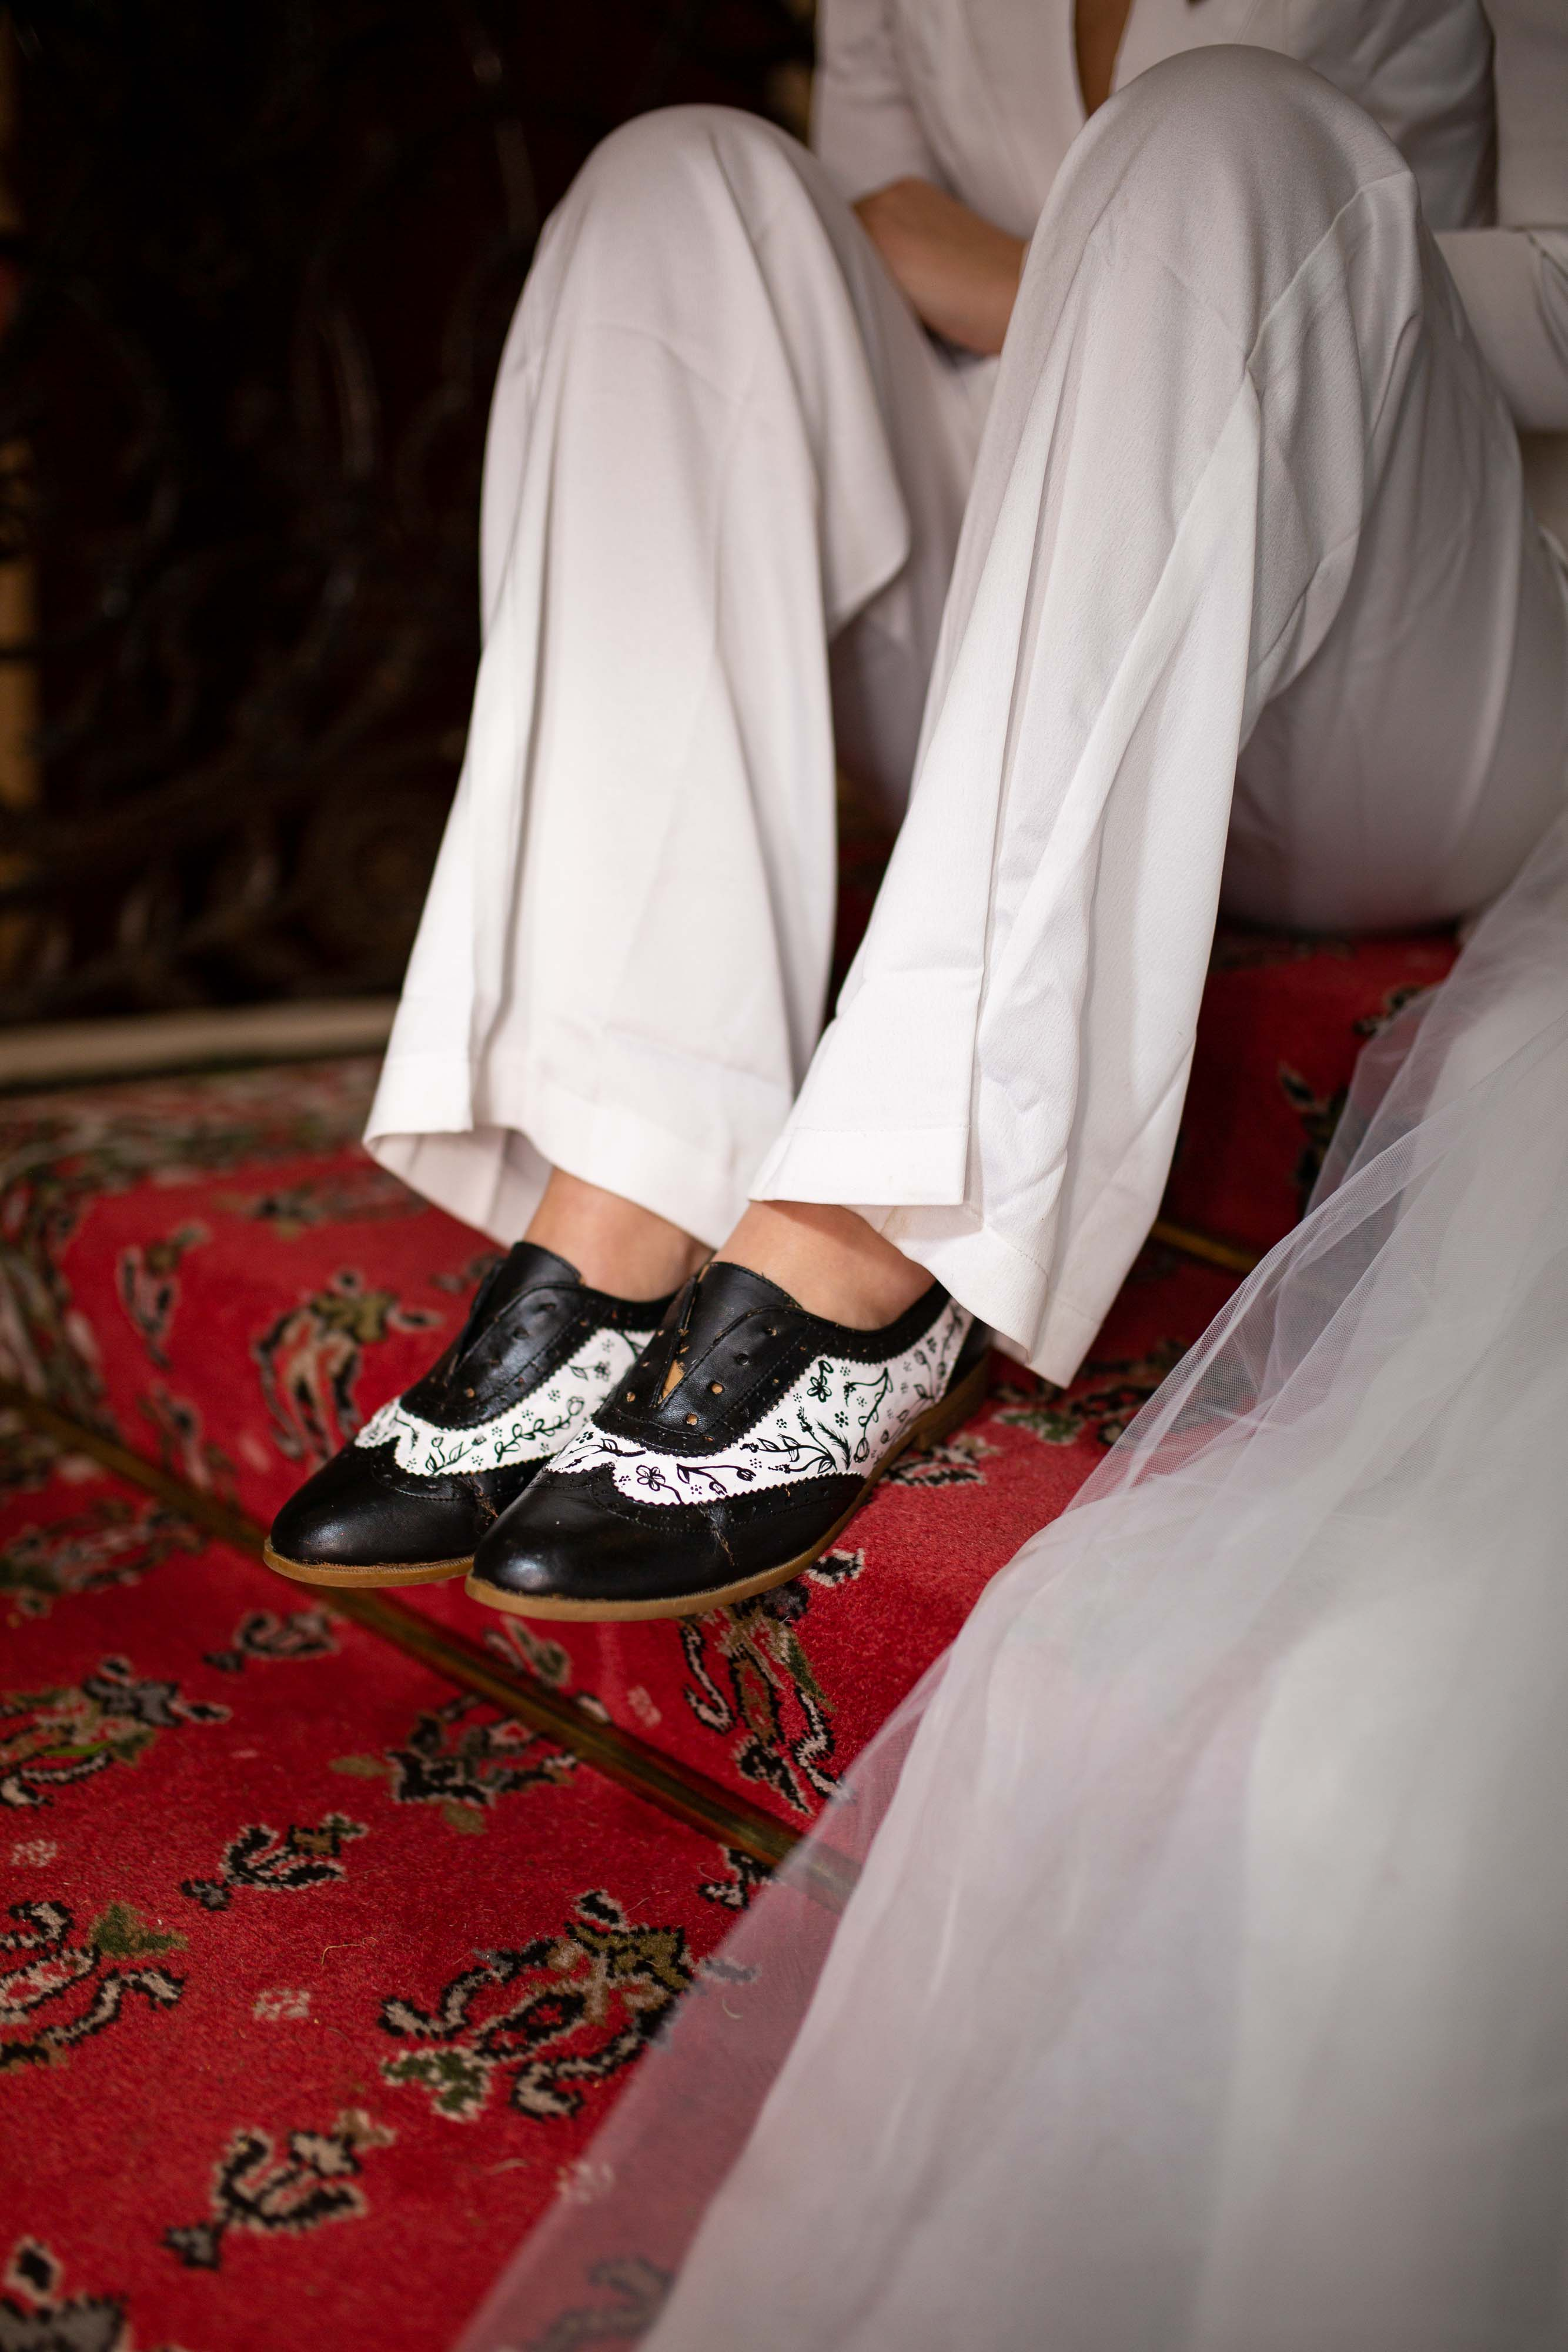 iconic wedding looks- music themed wedding- unconventional wedding- alternative wedding- womens flat wedding shoes- unique wedding shoes